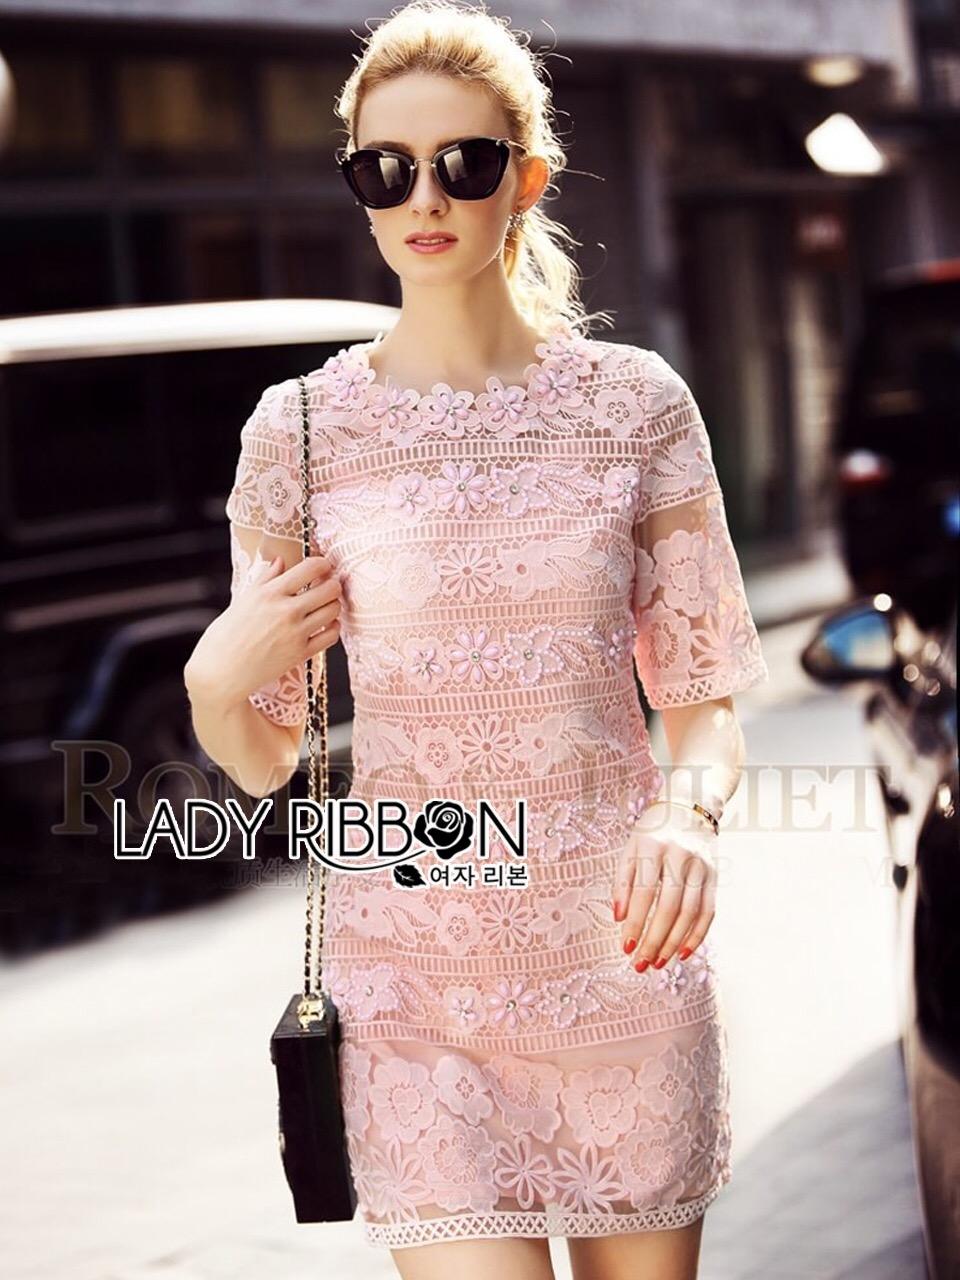 Lady Ribbon เดรสผ้าลูกไม้สีชมพู